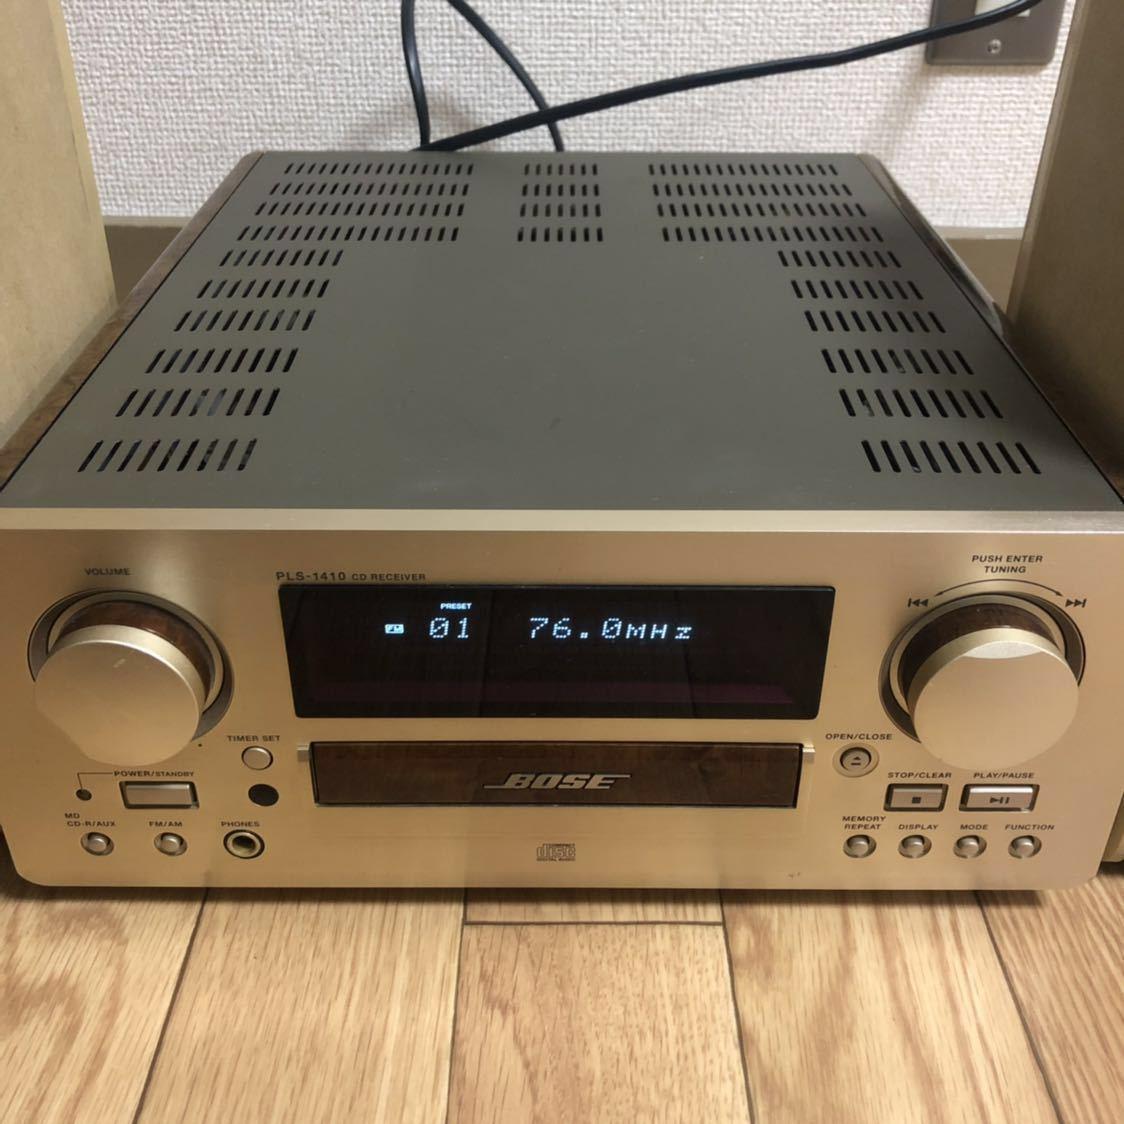 Bose CDレシーバー PLS-1410 ◇ BOSE スピーカー ADVANCED SOUND SYSTEM Model 125 セット_画像2